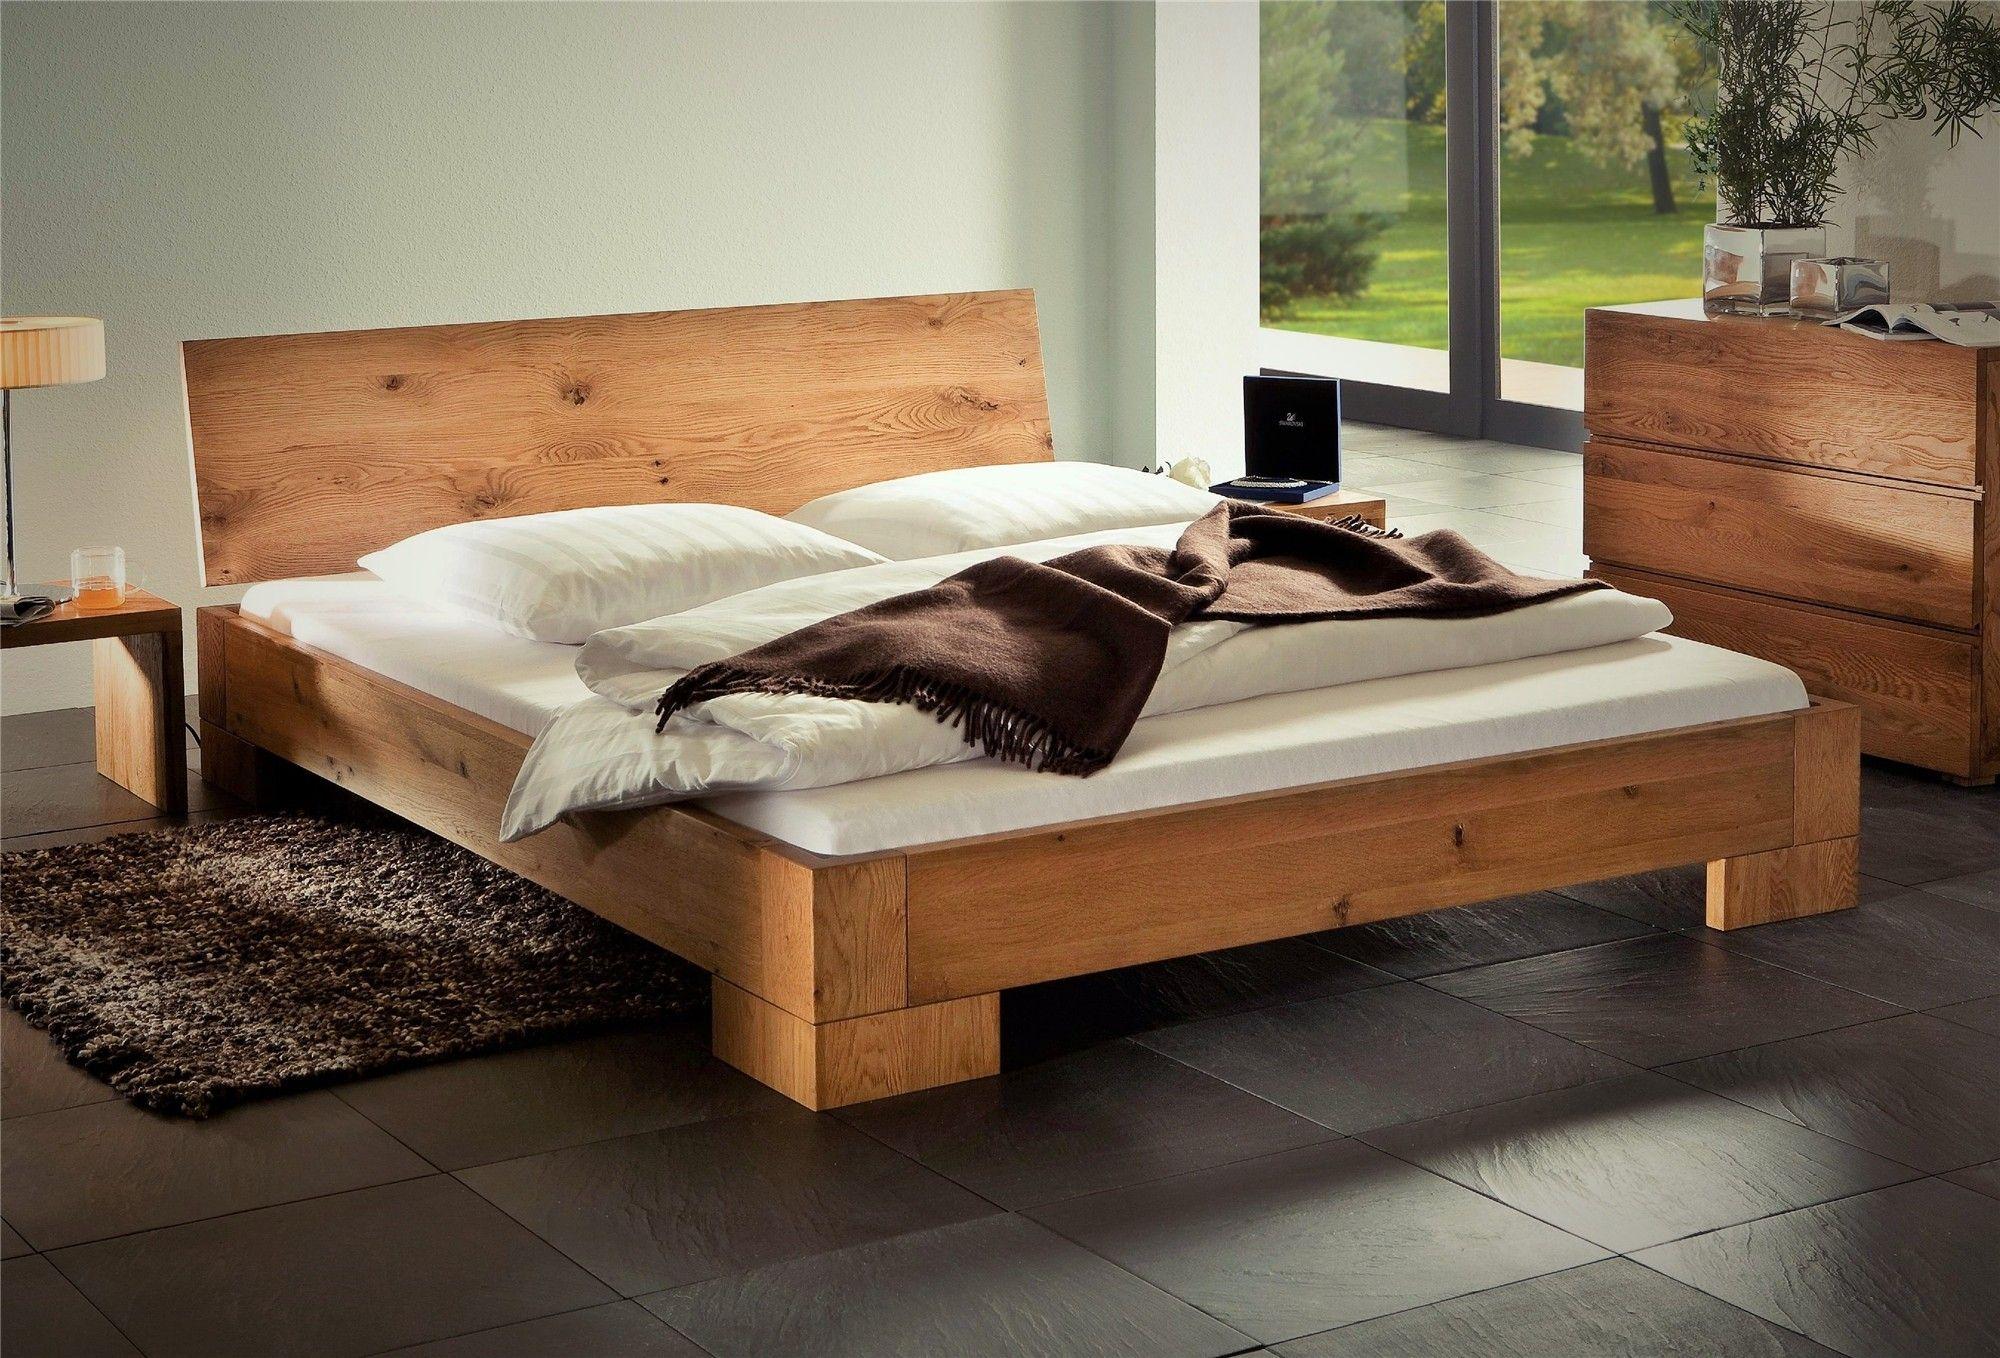 Solid Wood Beds Hasena Oakline Vaco Varus Solid Oak Bed Head2bed Uk Spalna